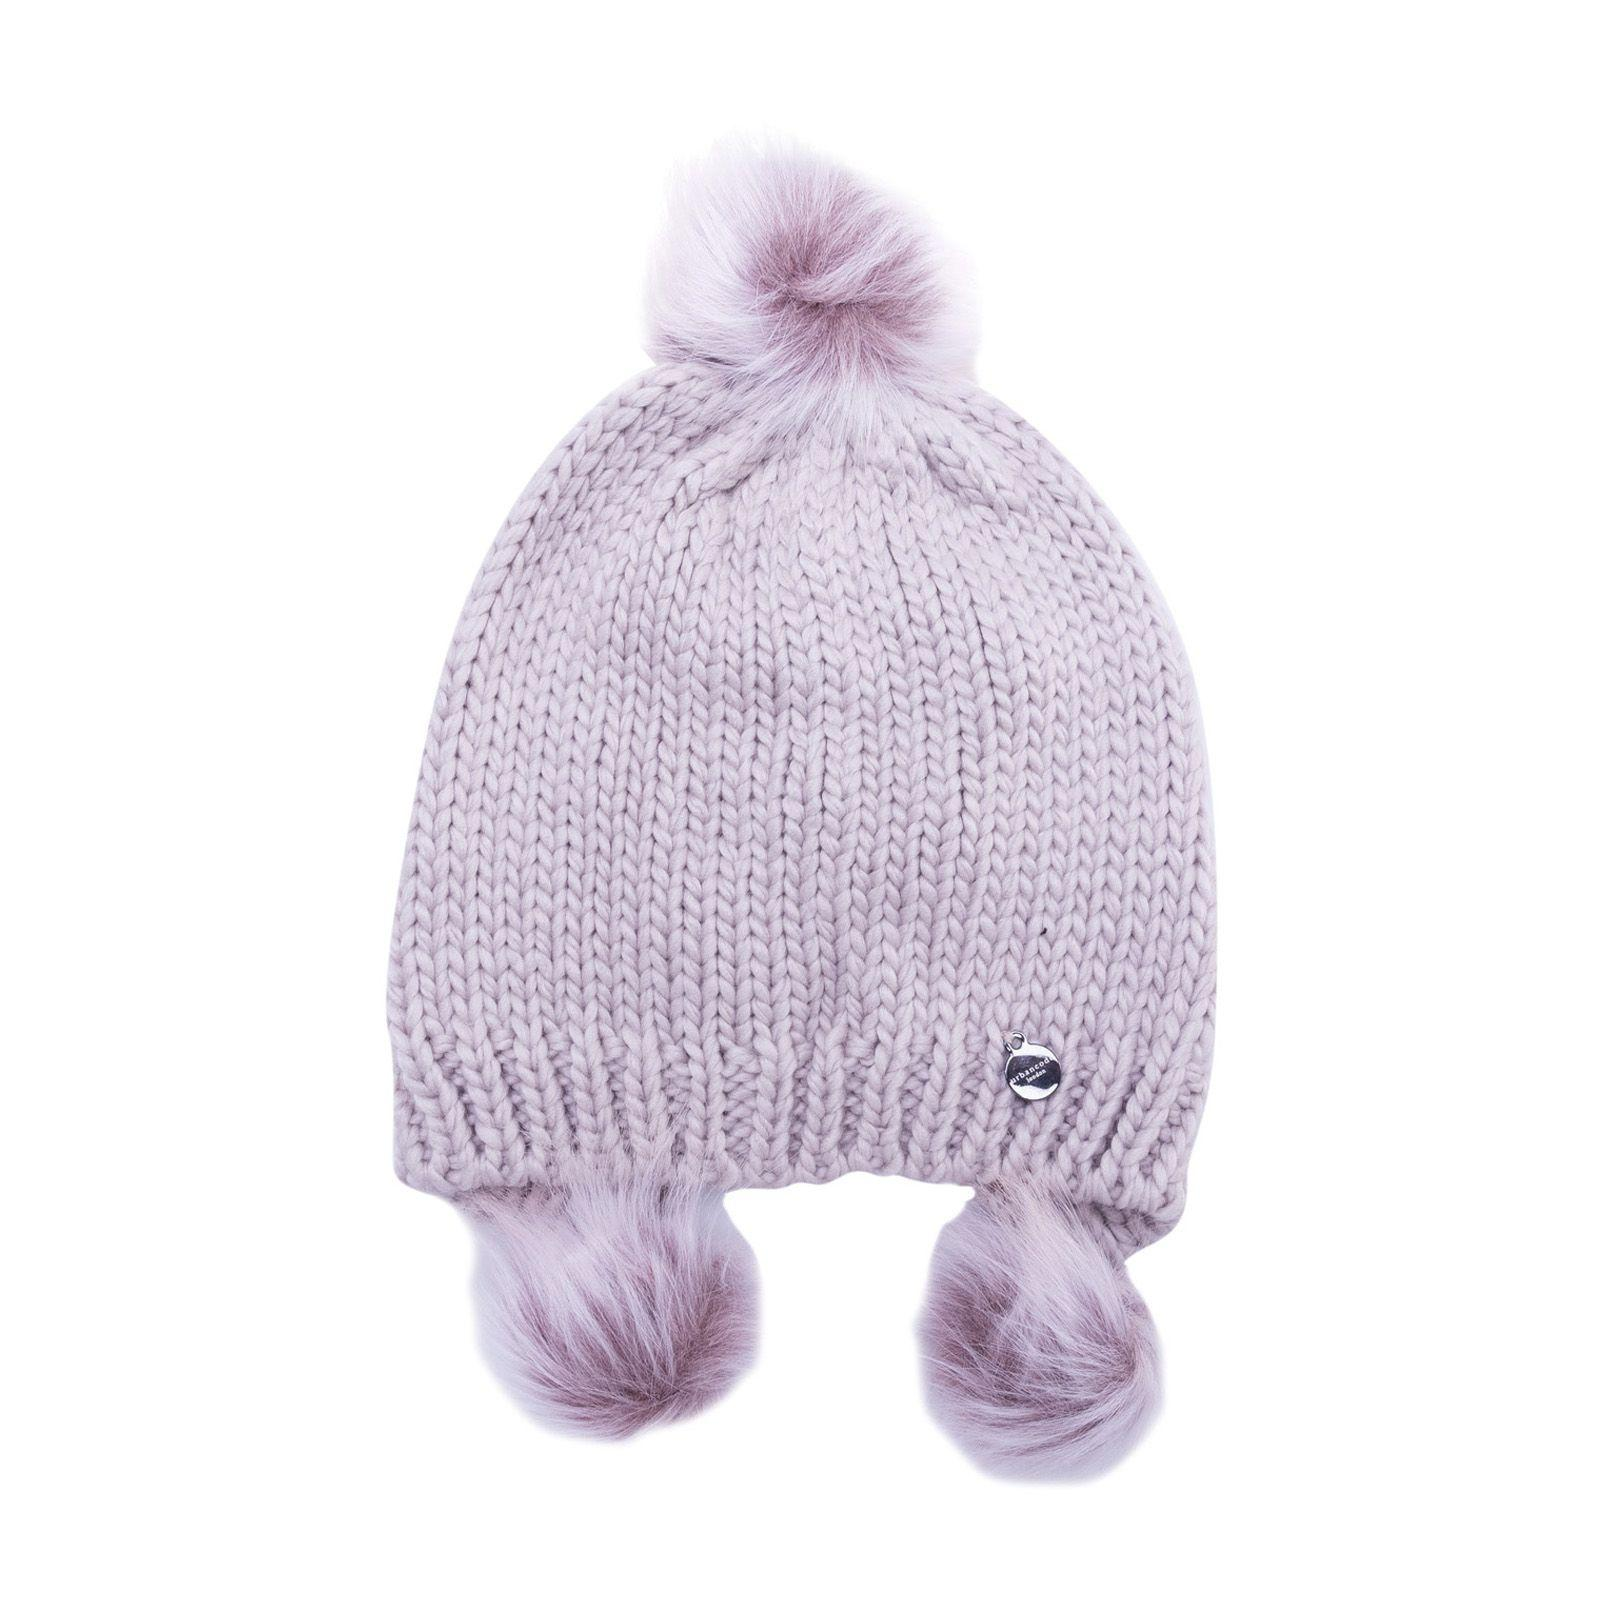 Urbancode Pompom Hat In Unicorn Pink